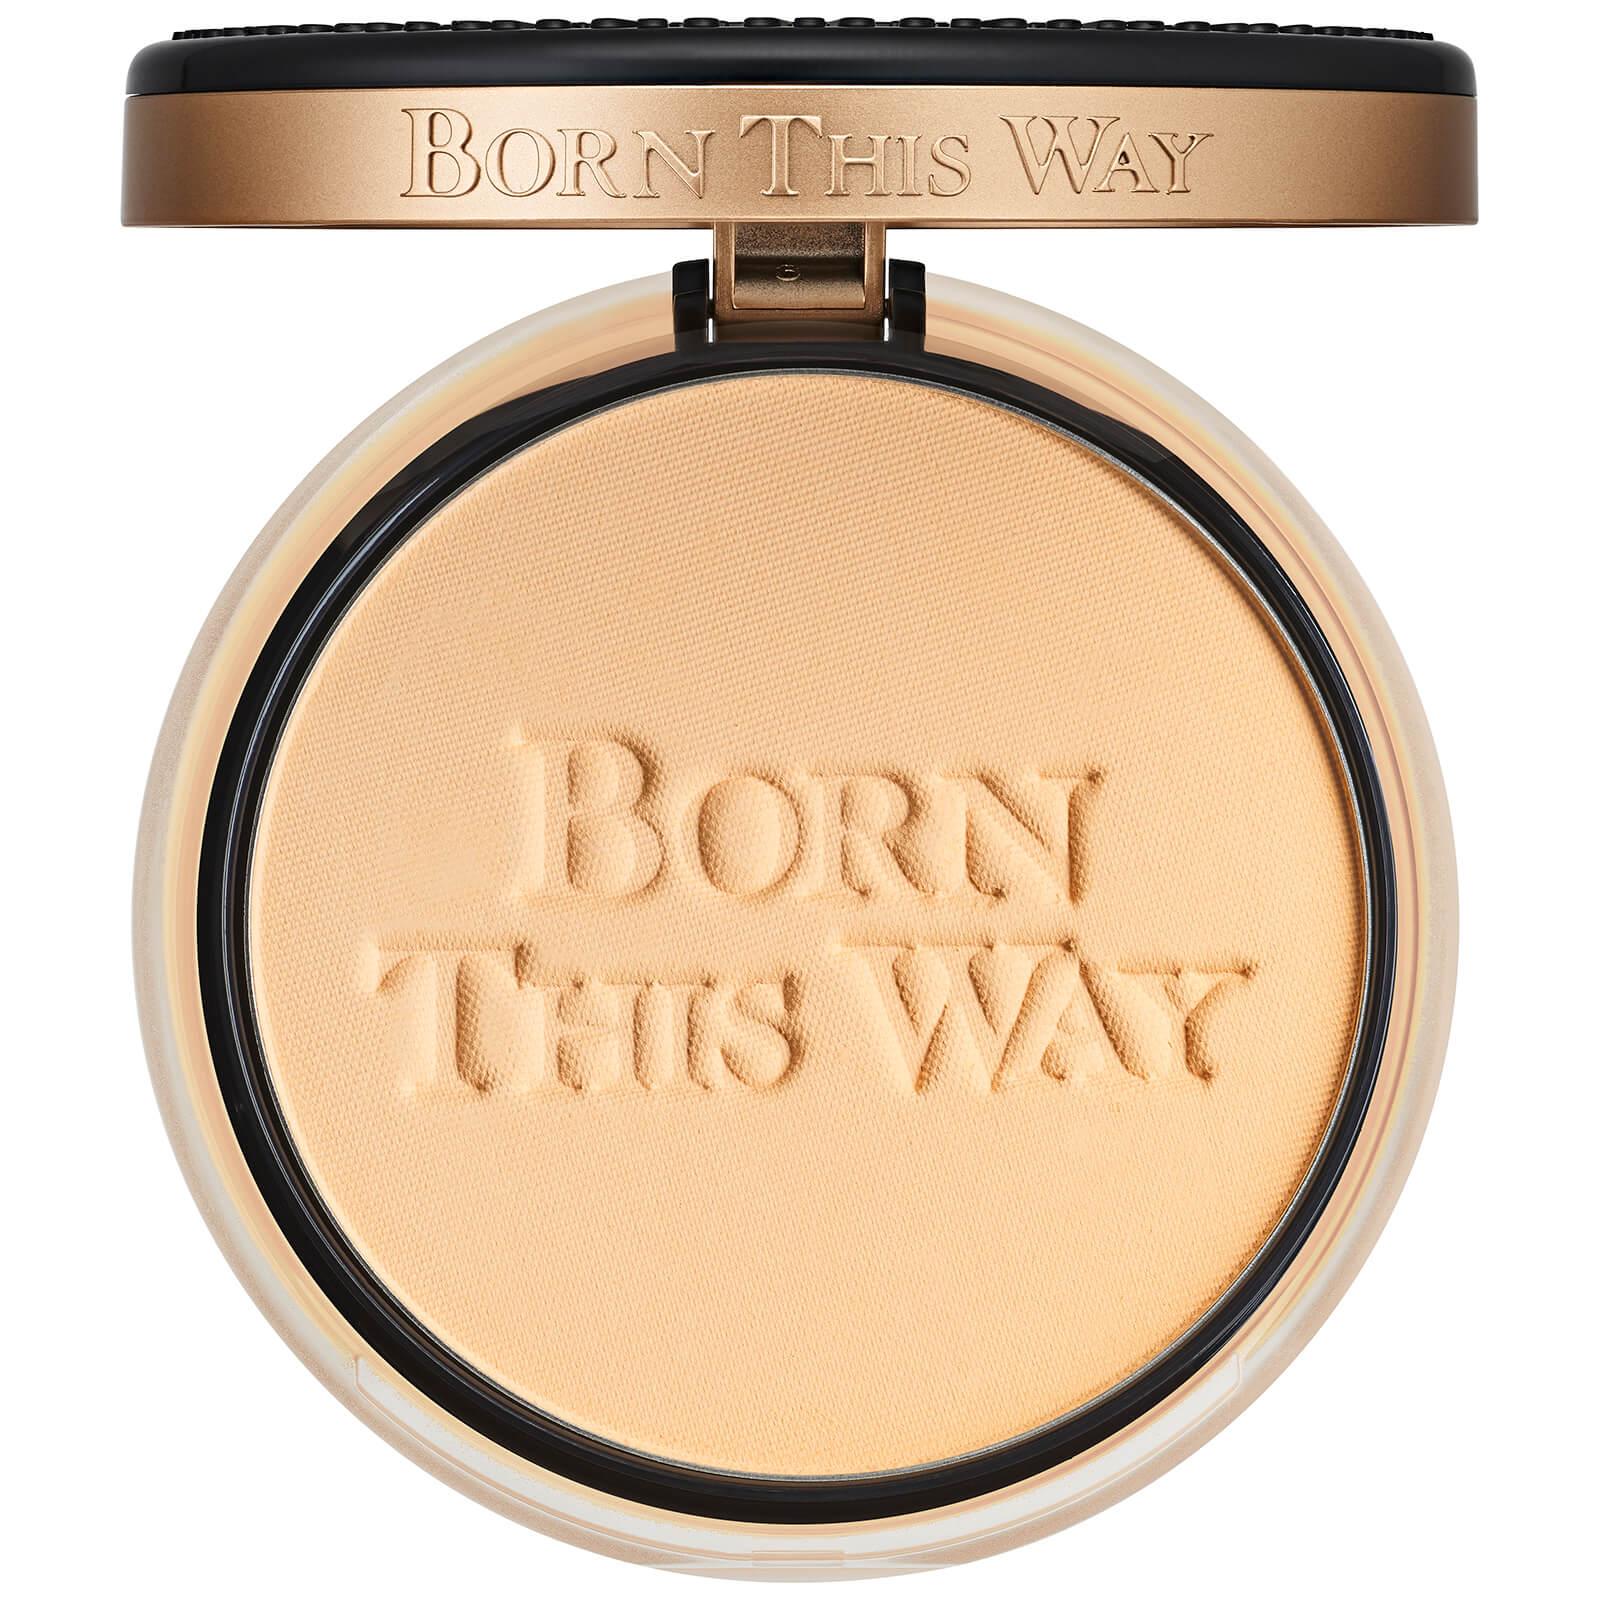 Too Faced Born This Way Multi-Use Complexion Powder (Various Shades) - Vanilla